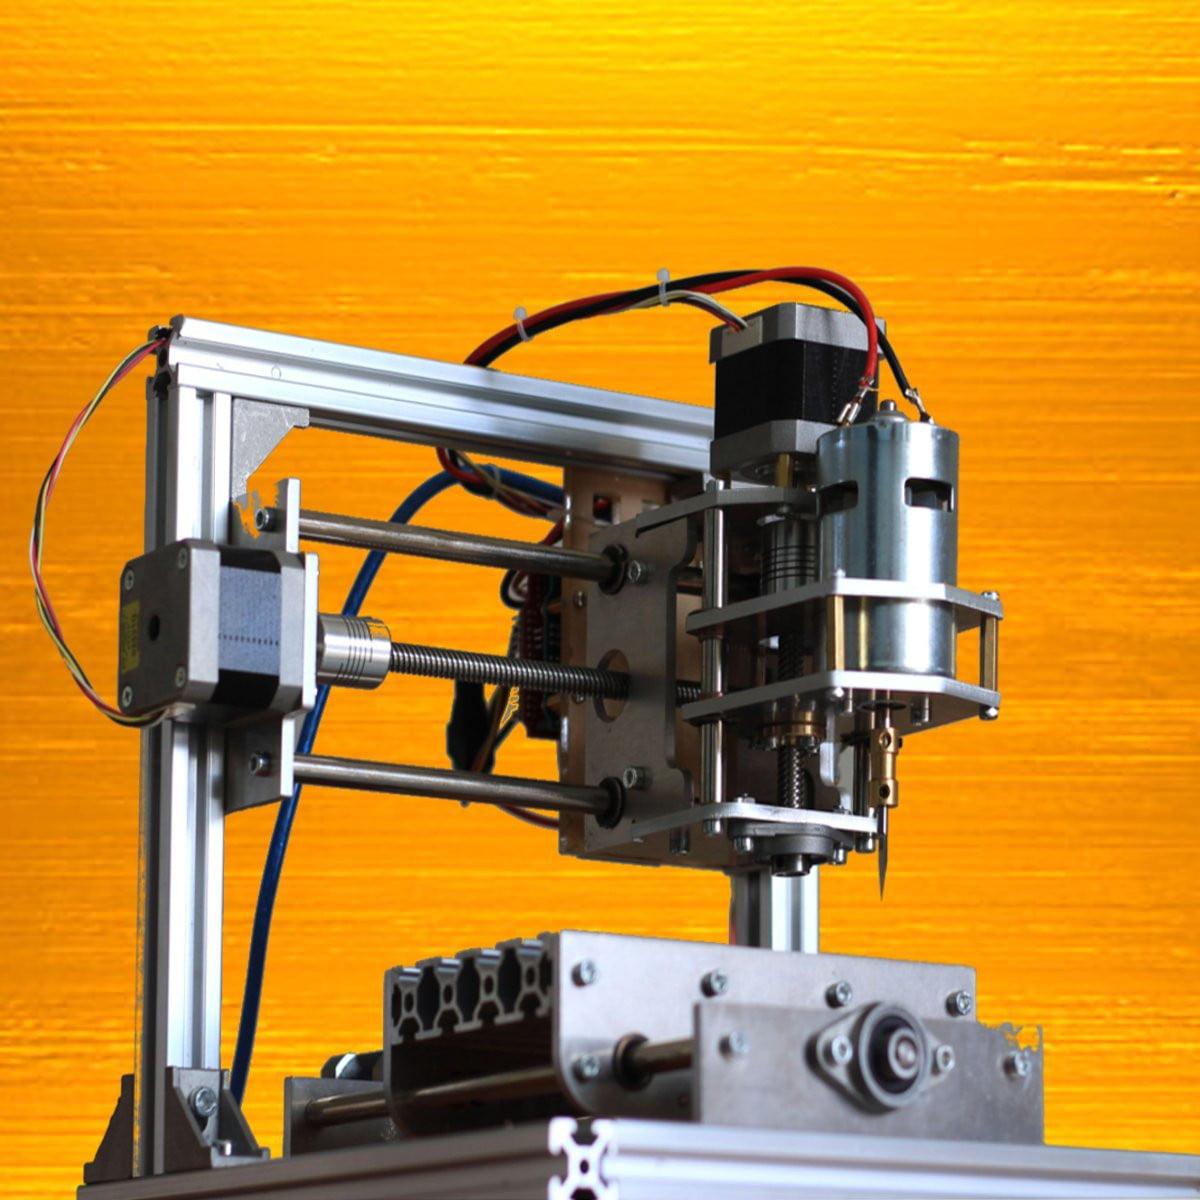 Diy 3 Axis Cnc Engraver Machine Pcb Milling Cutting Wood